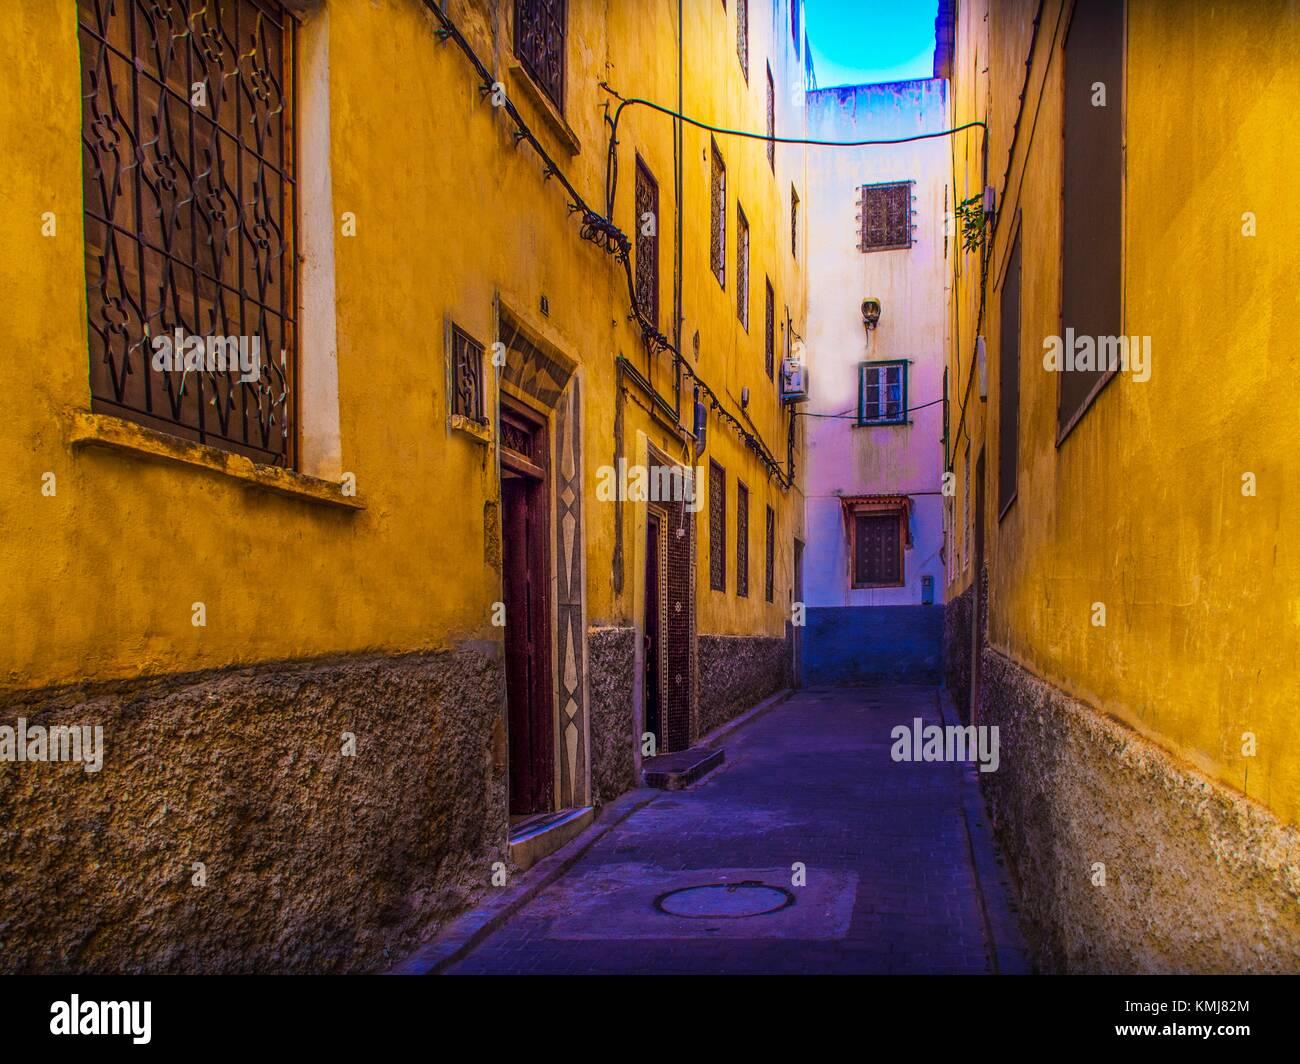 Marokko, Fes, Straße im Bereich Ziat, 'MEdina' (Altstadt) von Fes. Stockfoto